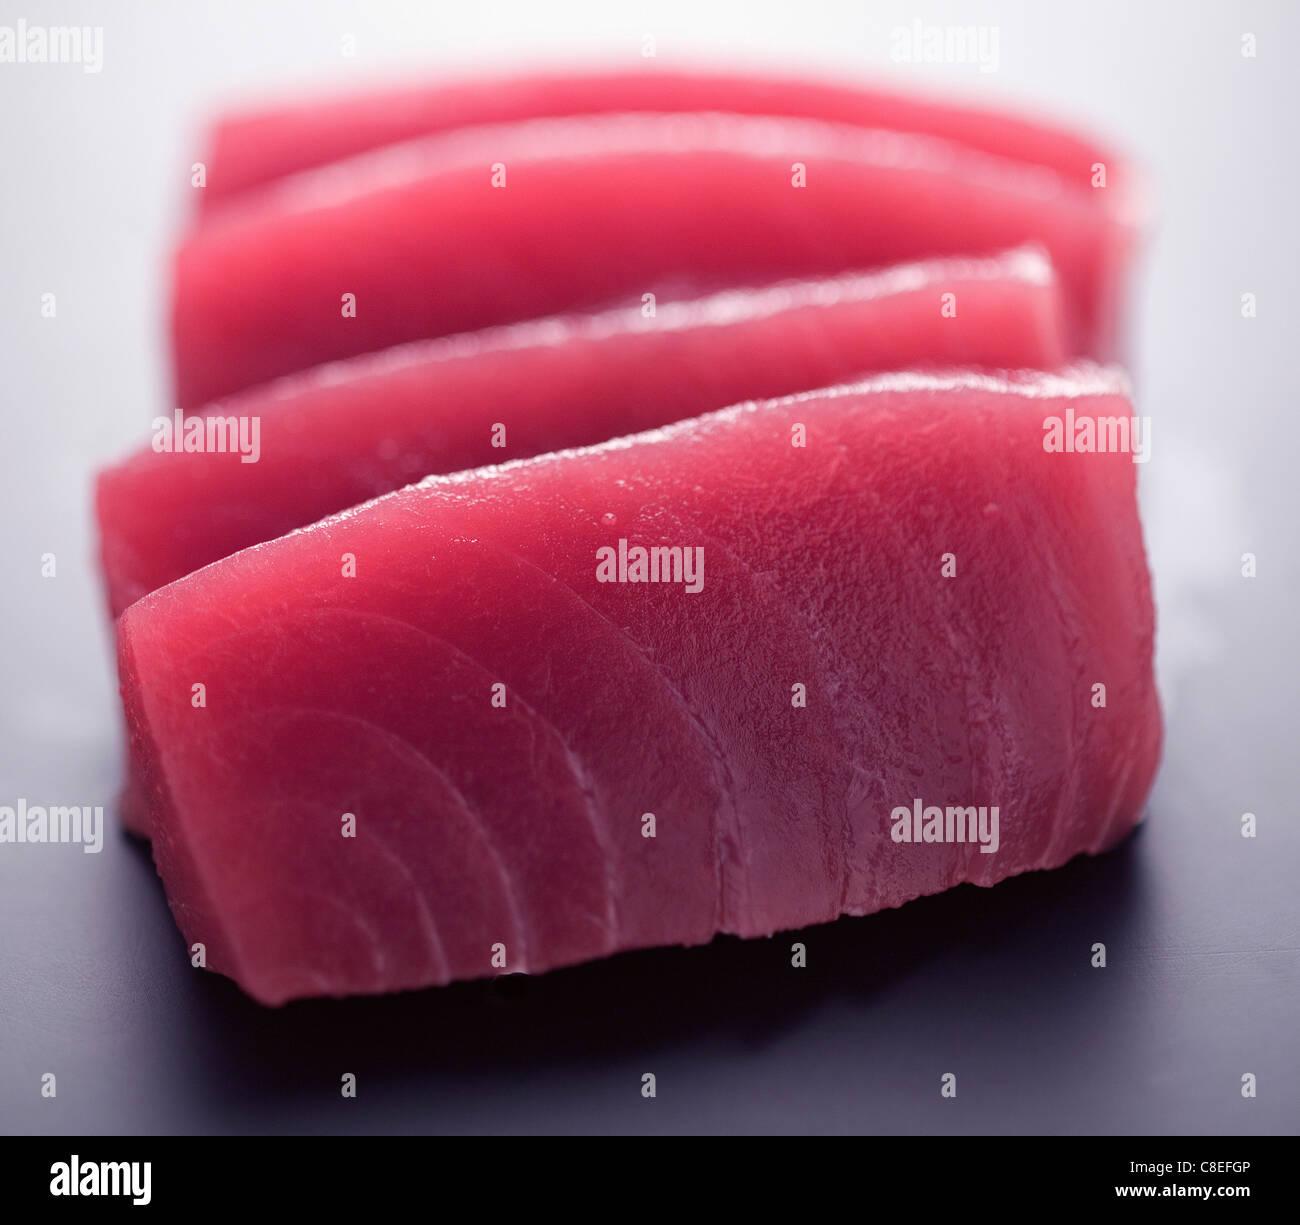 Roter Thunfisch schottische Stockbild